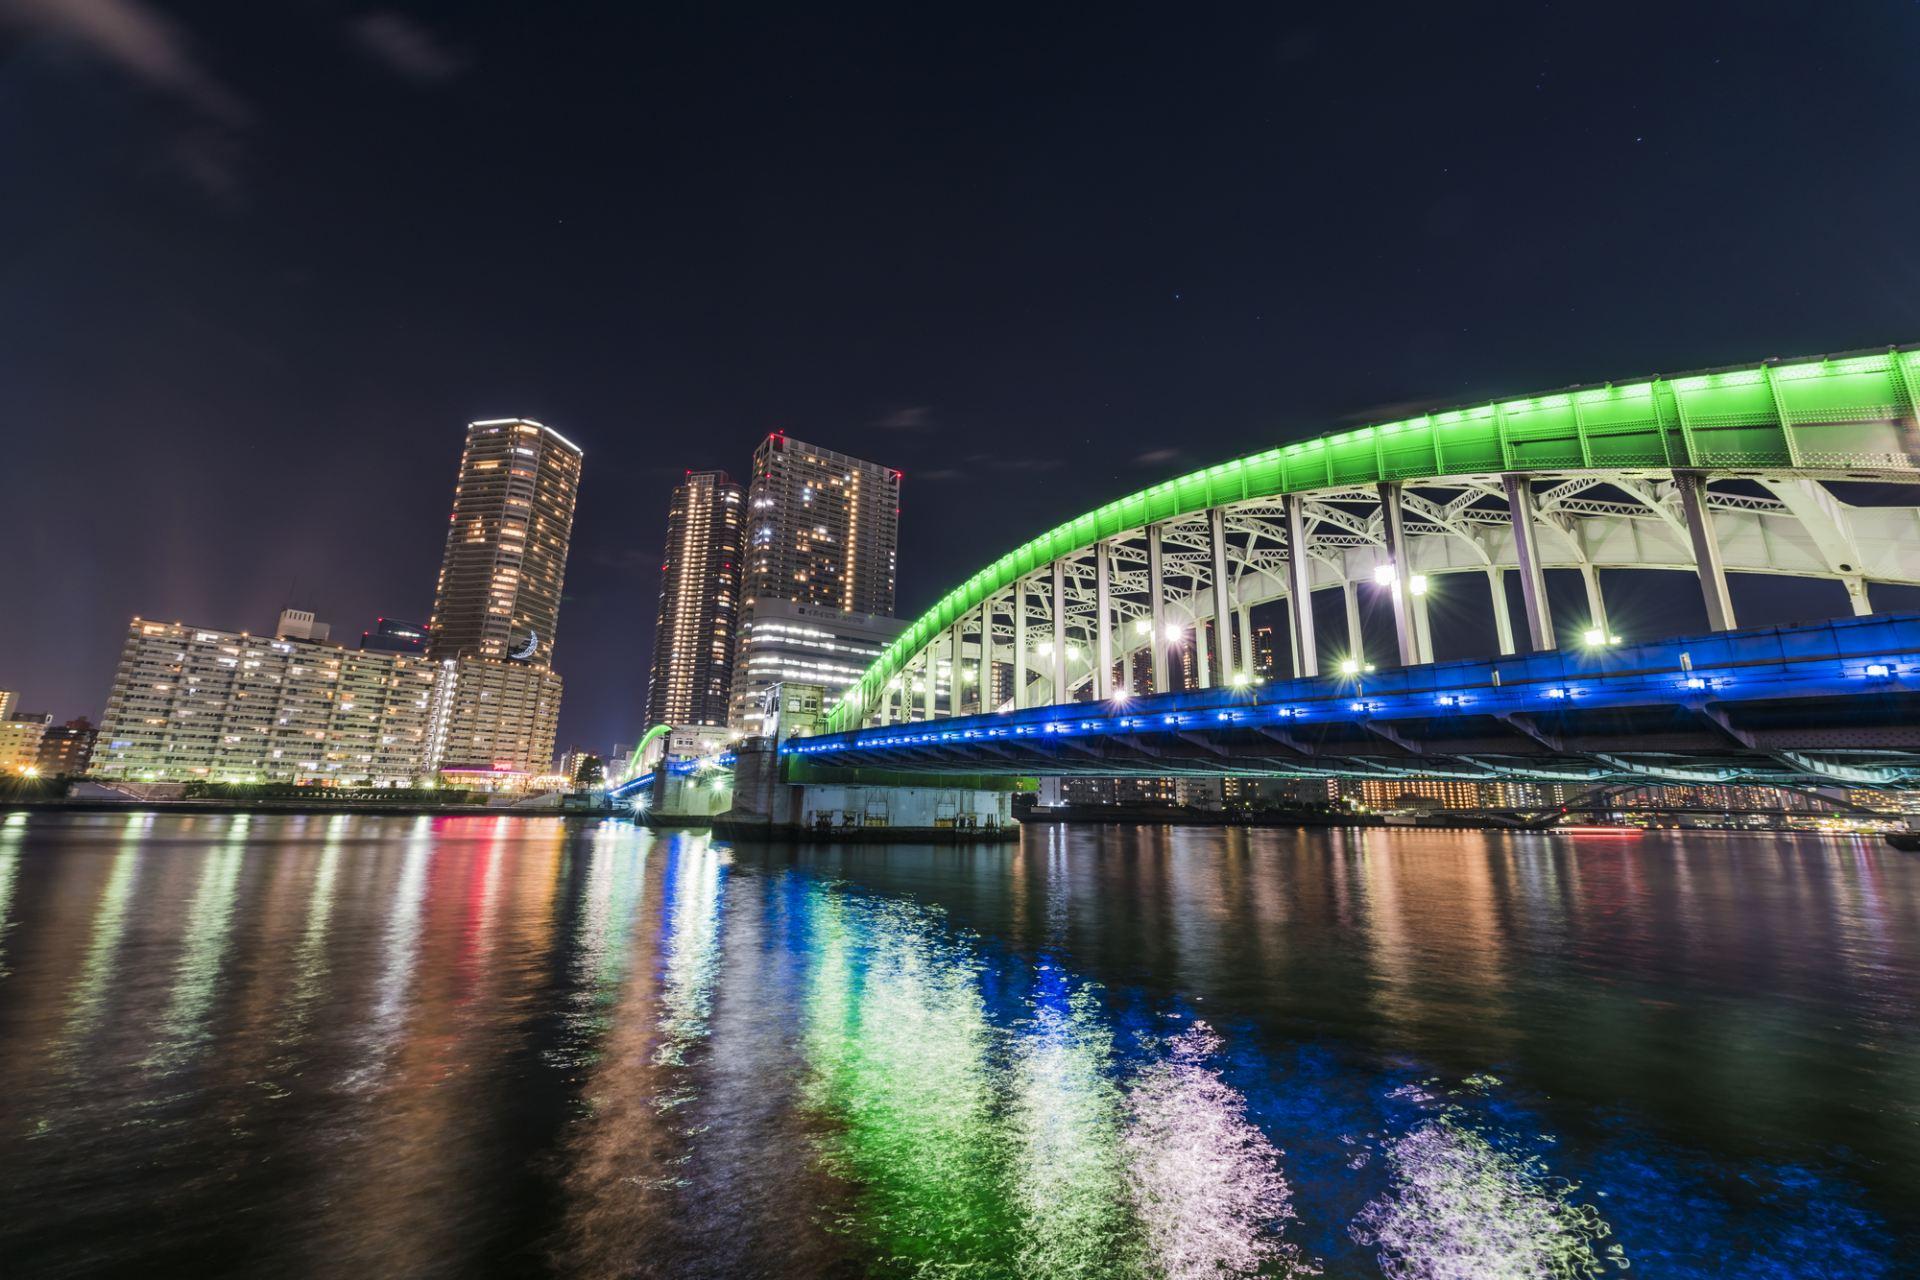 Kachidoki Bridge Lit Up